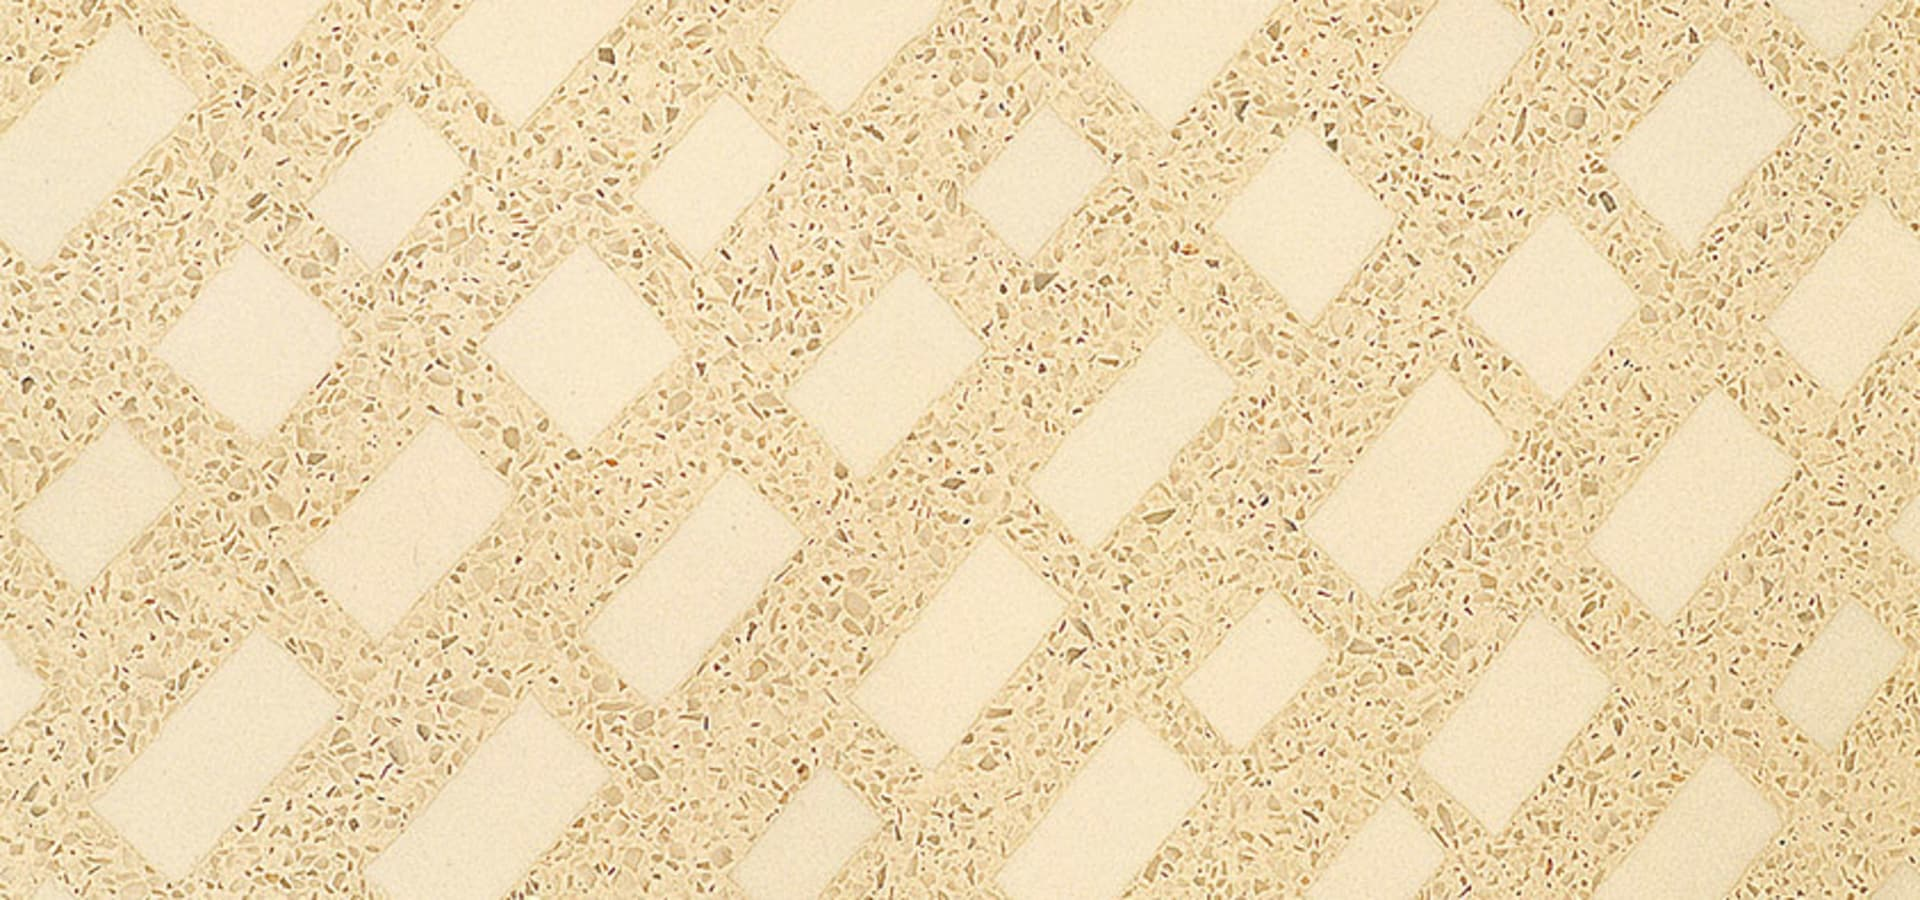 Terrazzo alla Veneziana, pavimento a mosaico by NEXUS srl   homify